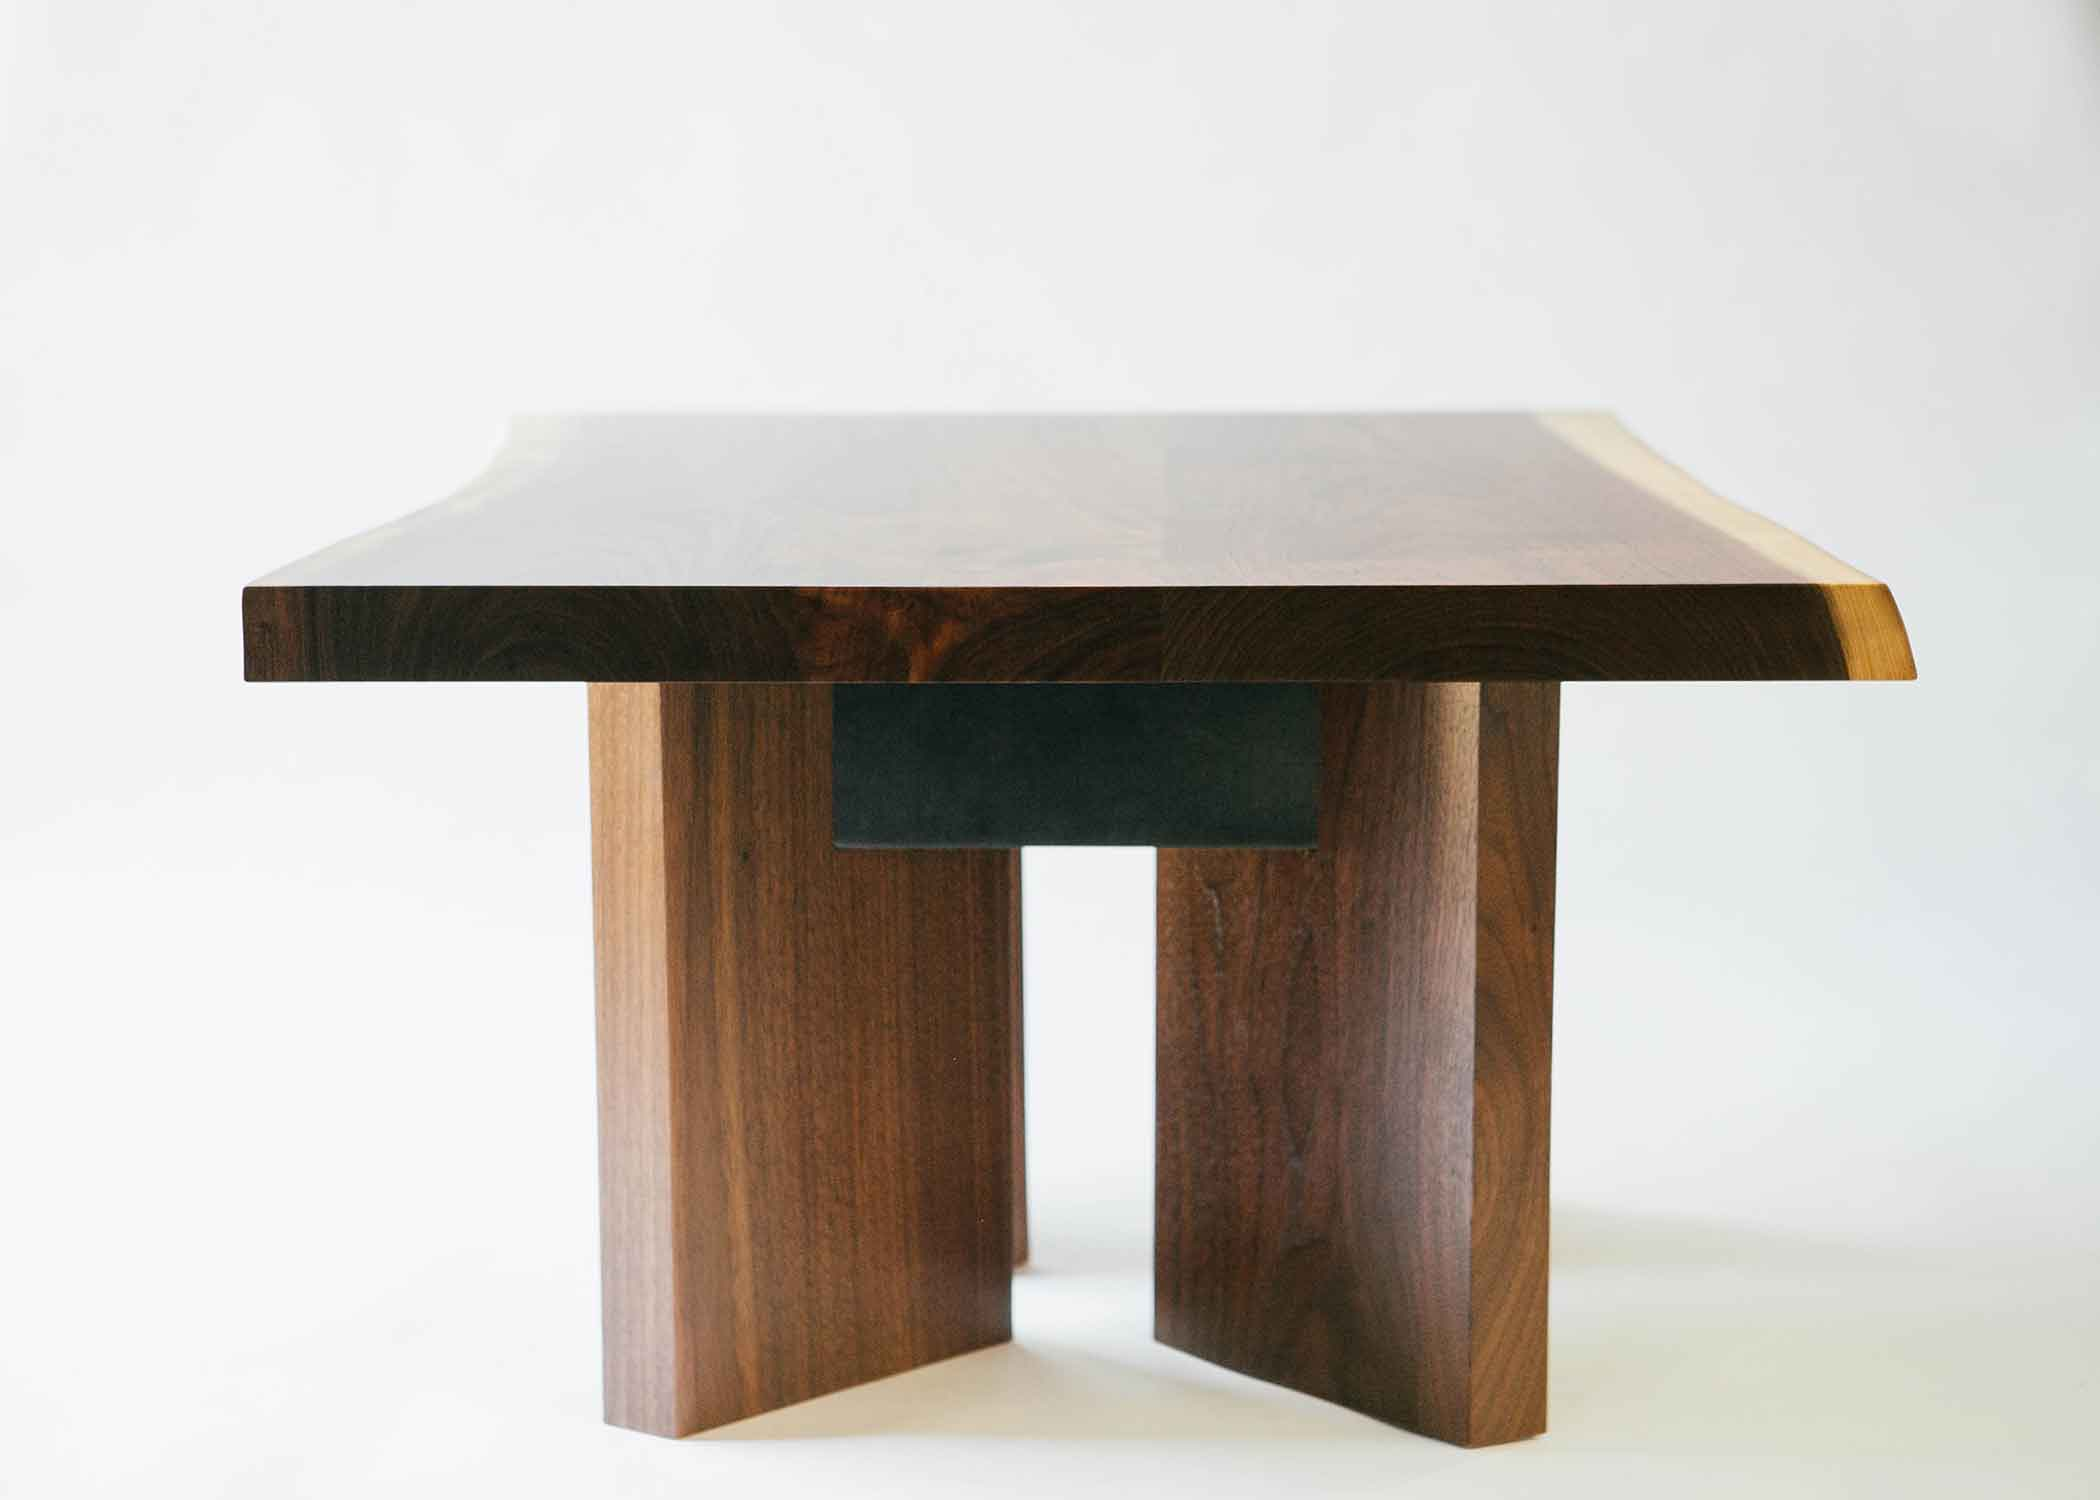 duke-x-table-ethan-harrison-photography-1081.jpg